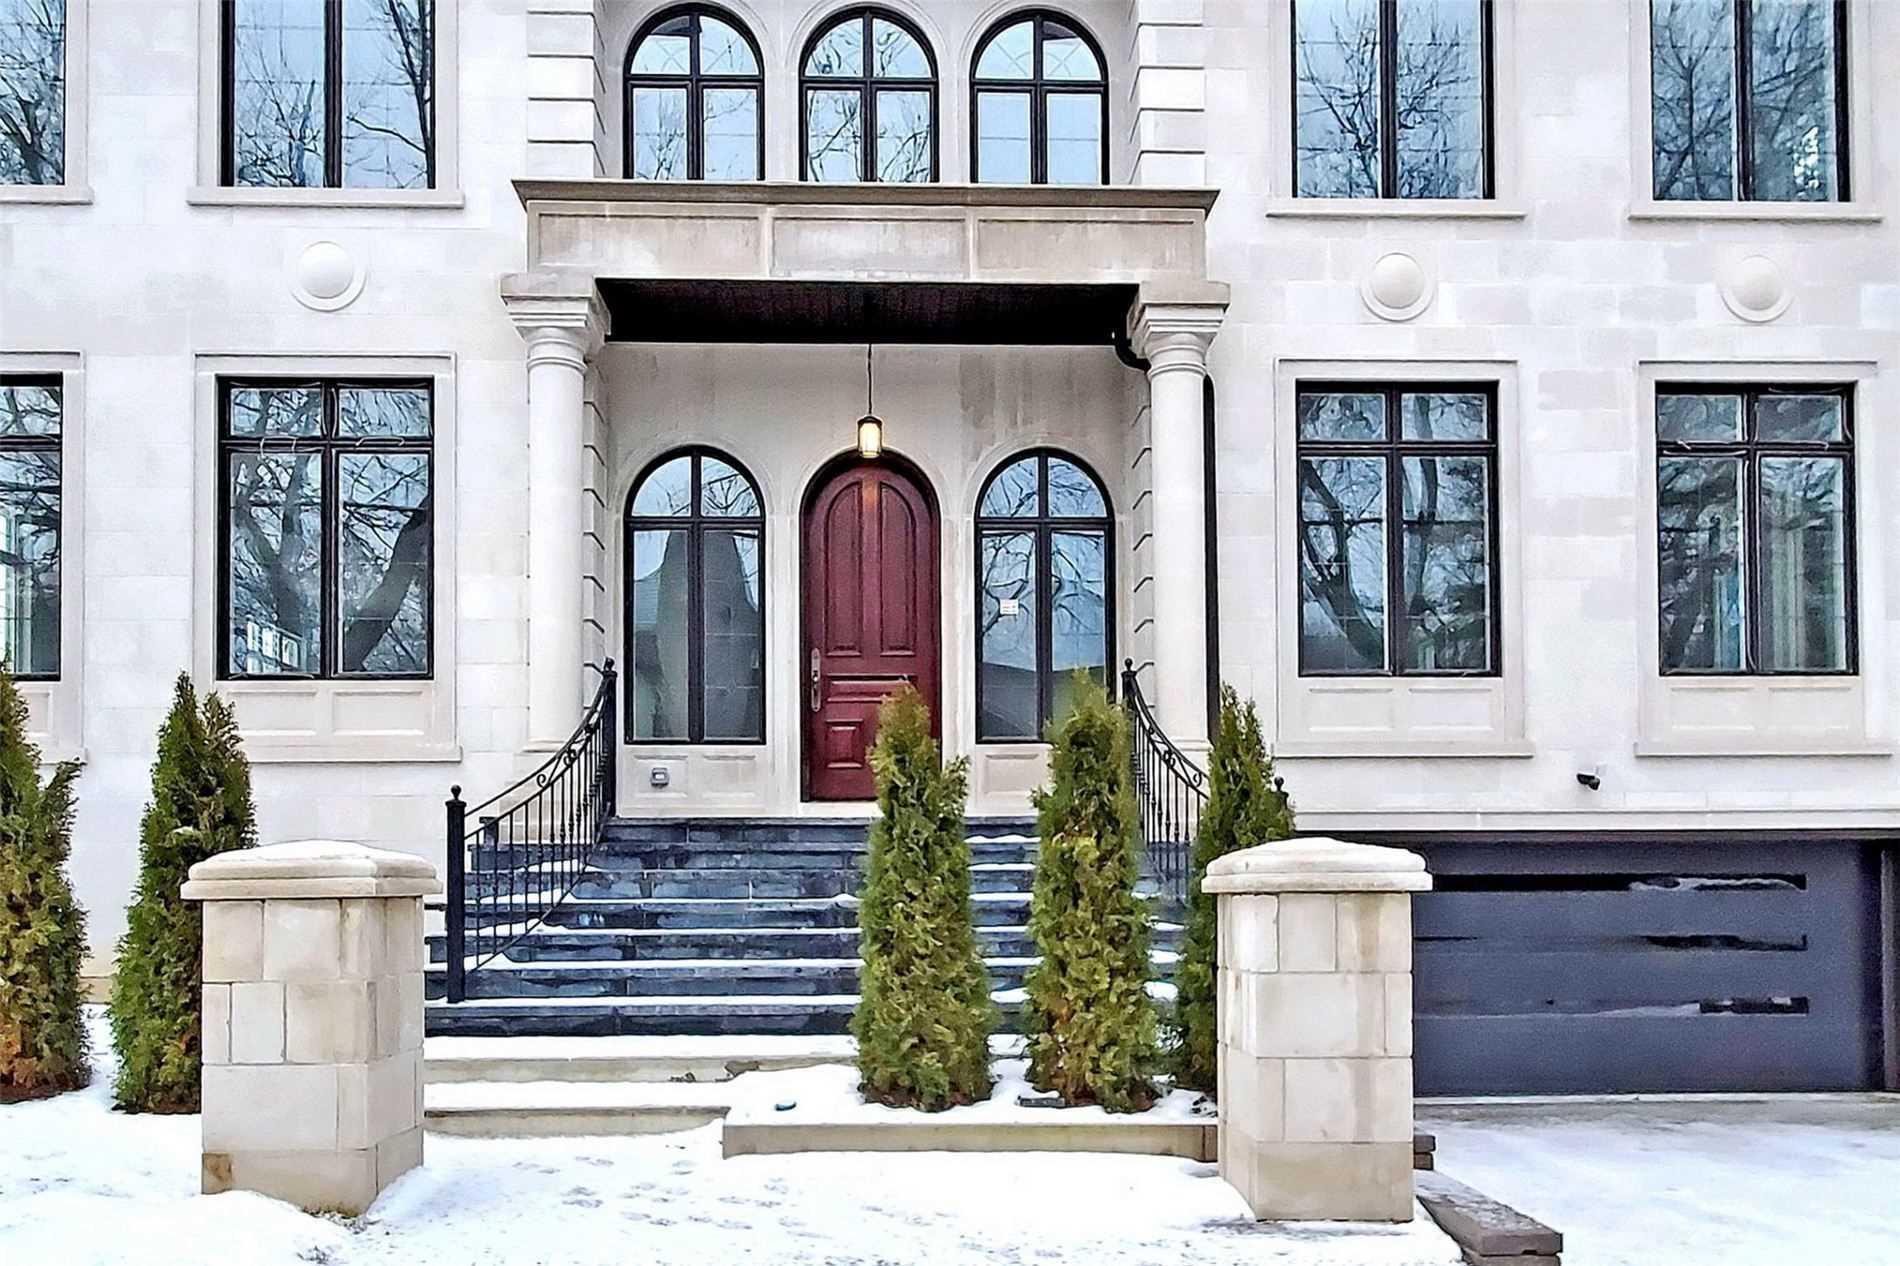 107 Hillcrest Ave, Toronto, Ontario M2N3N8, 6 Bedrooms Bedrooms, 10 Rooms Rooms,8 BathroomsBathrooms,Detached,For Sale,Hillcrest,C5161073